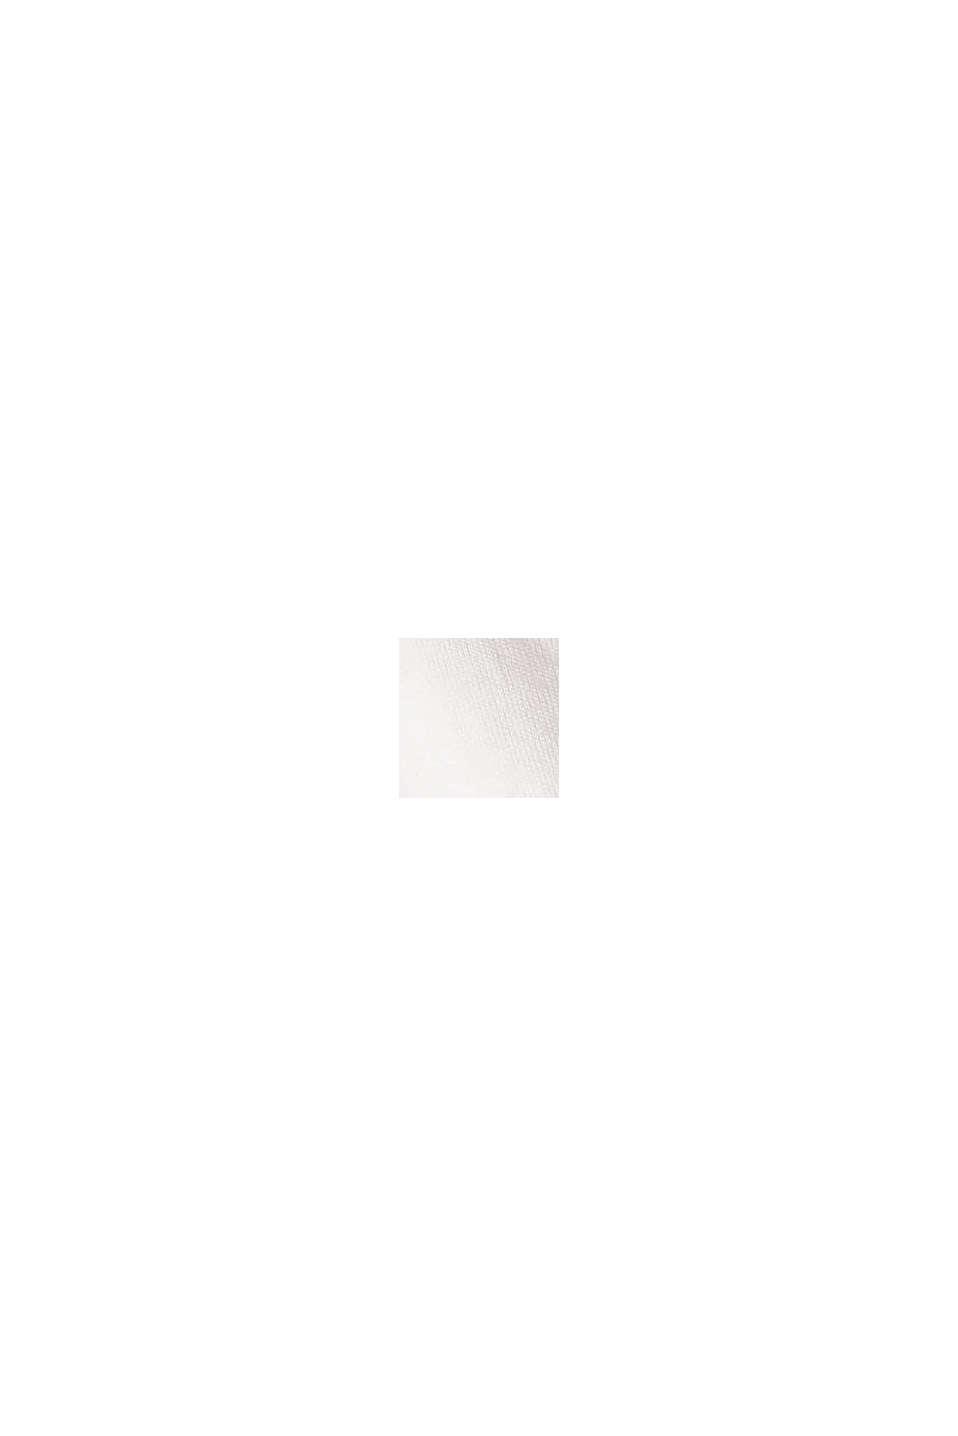 Camiseta de manga larga con frunces, algodón ecológico, OFF WHITE, swatch